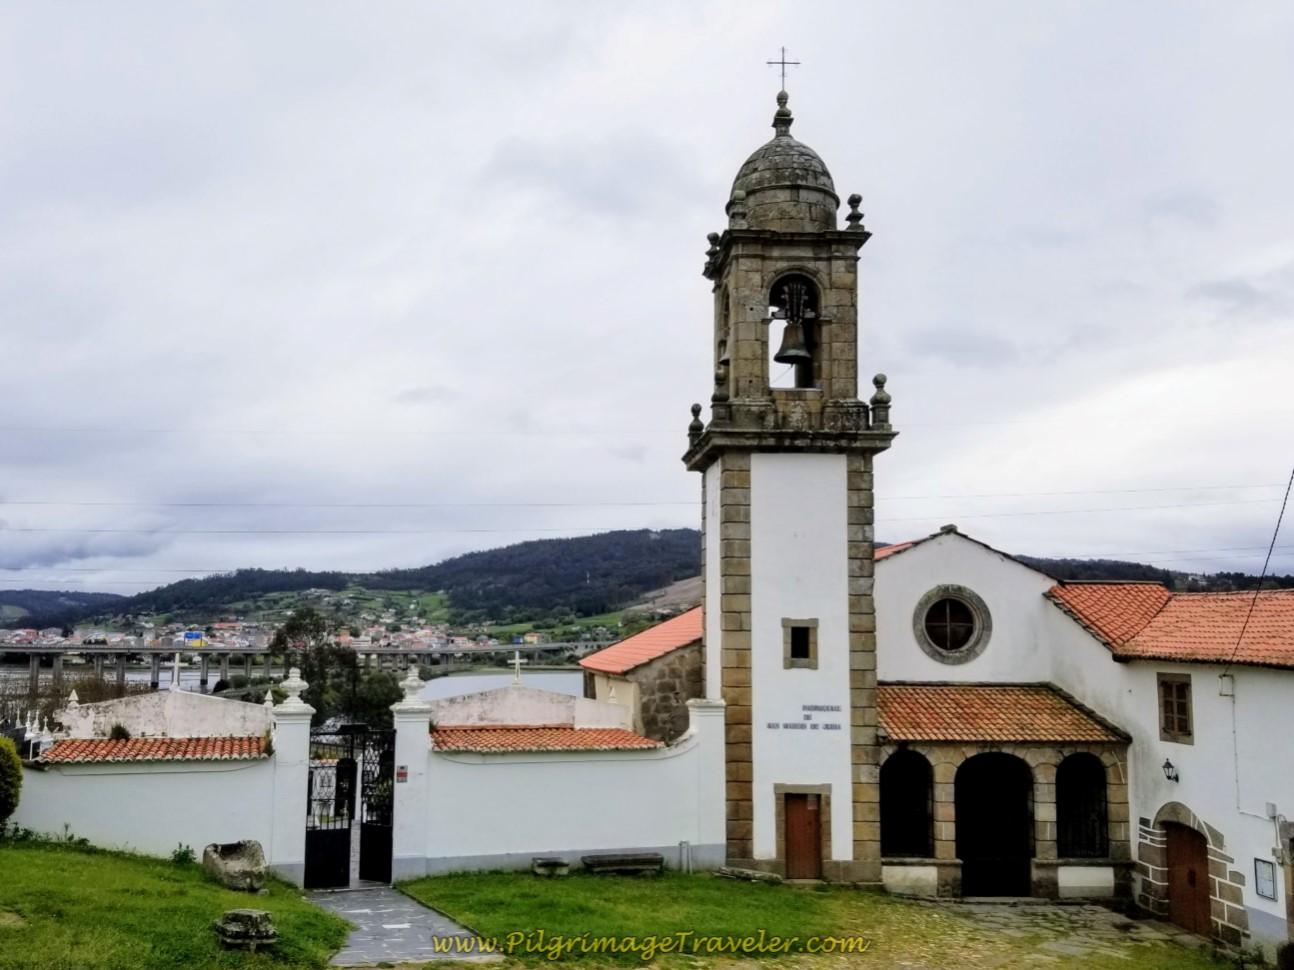 Monasterio de San Martiño de Xubia by the River on day one of the English Way